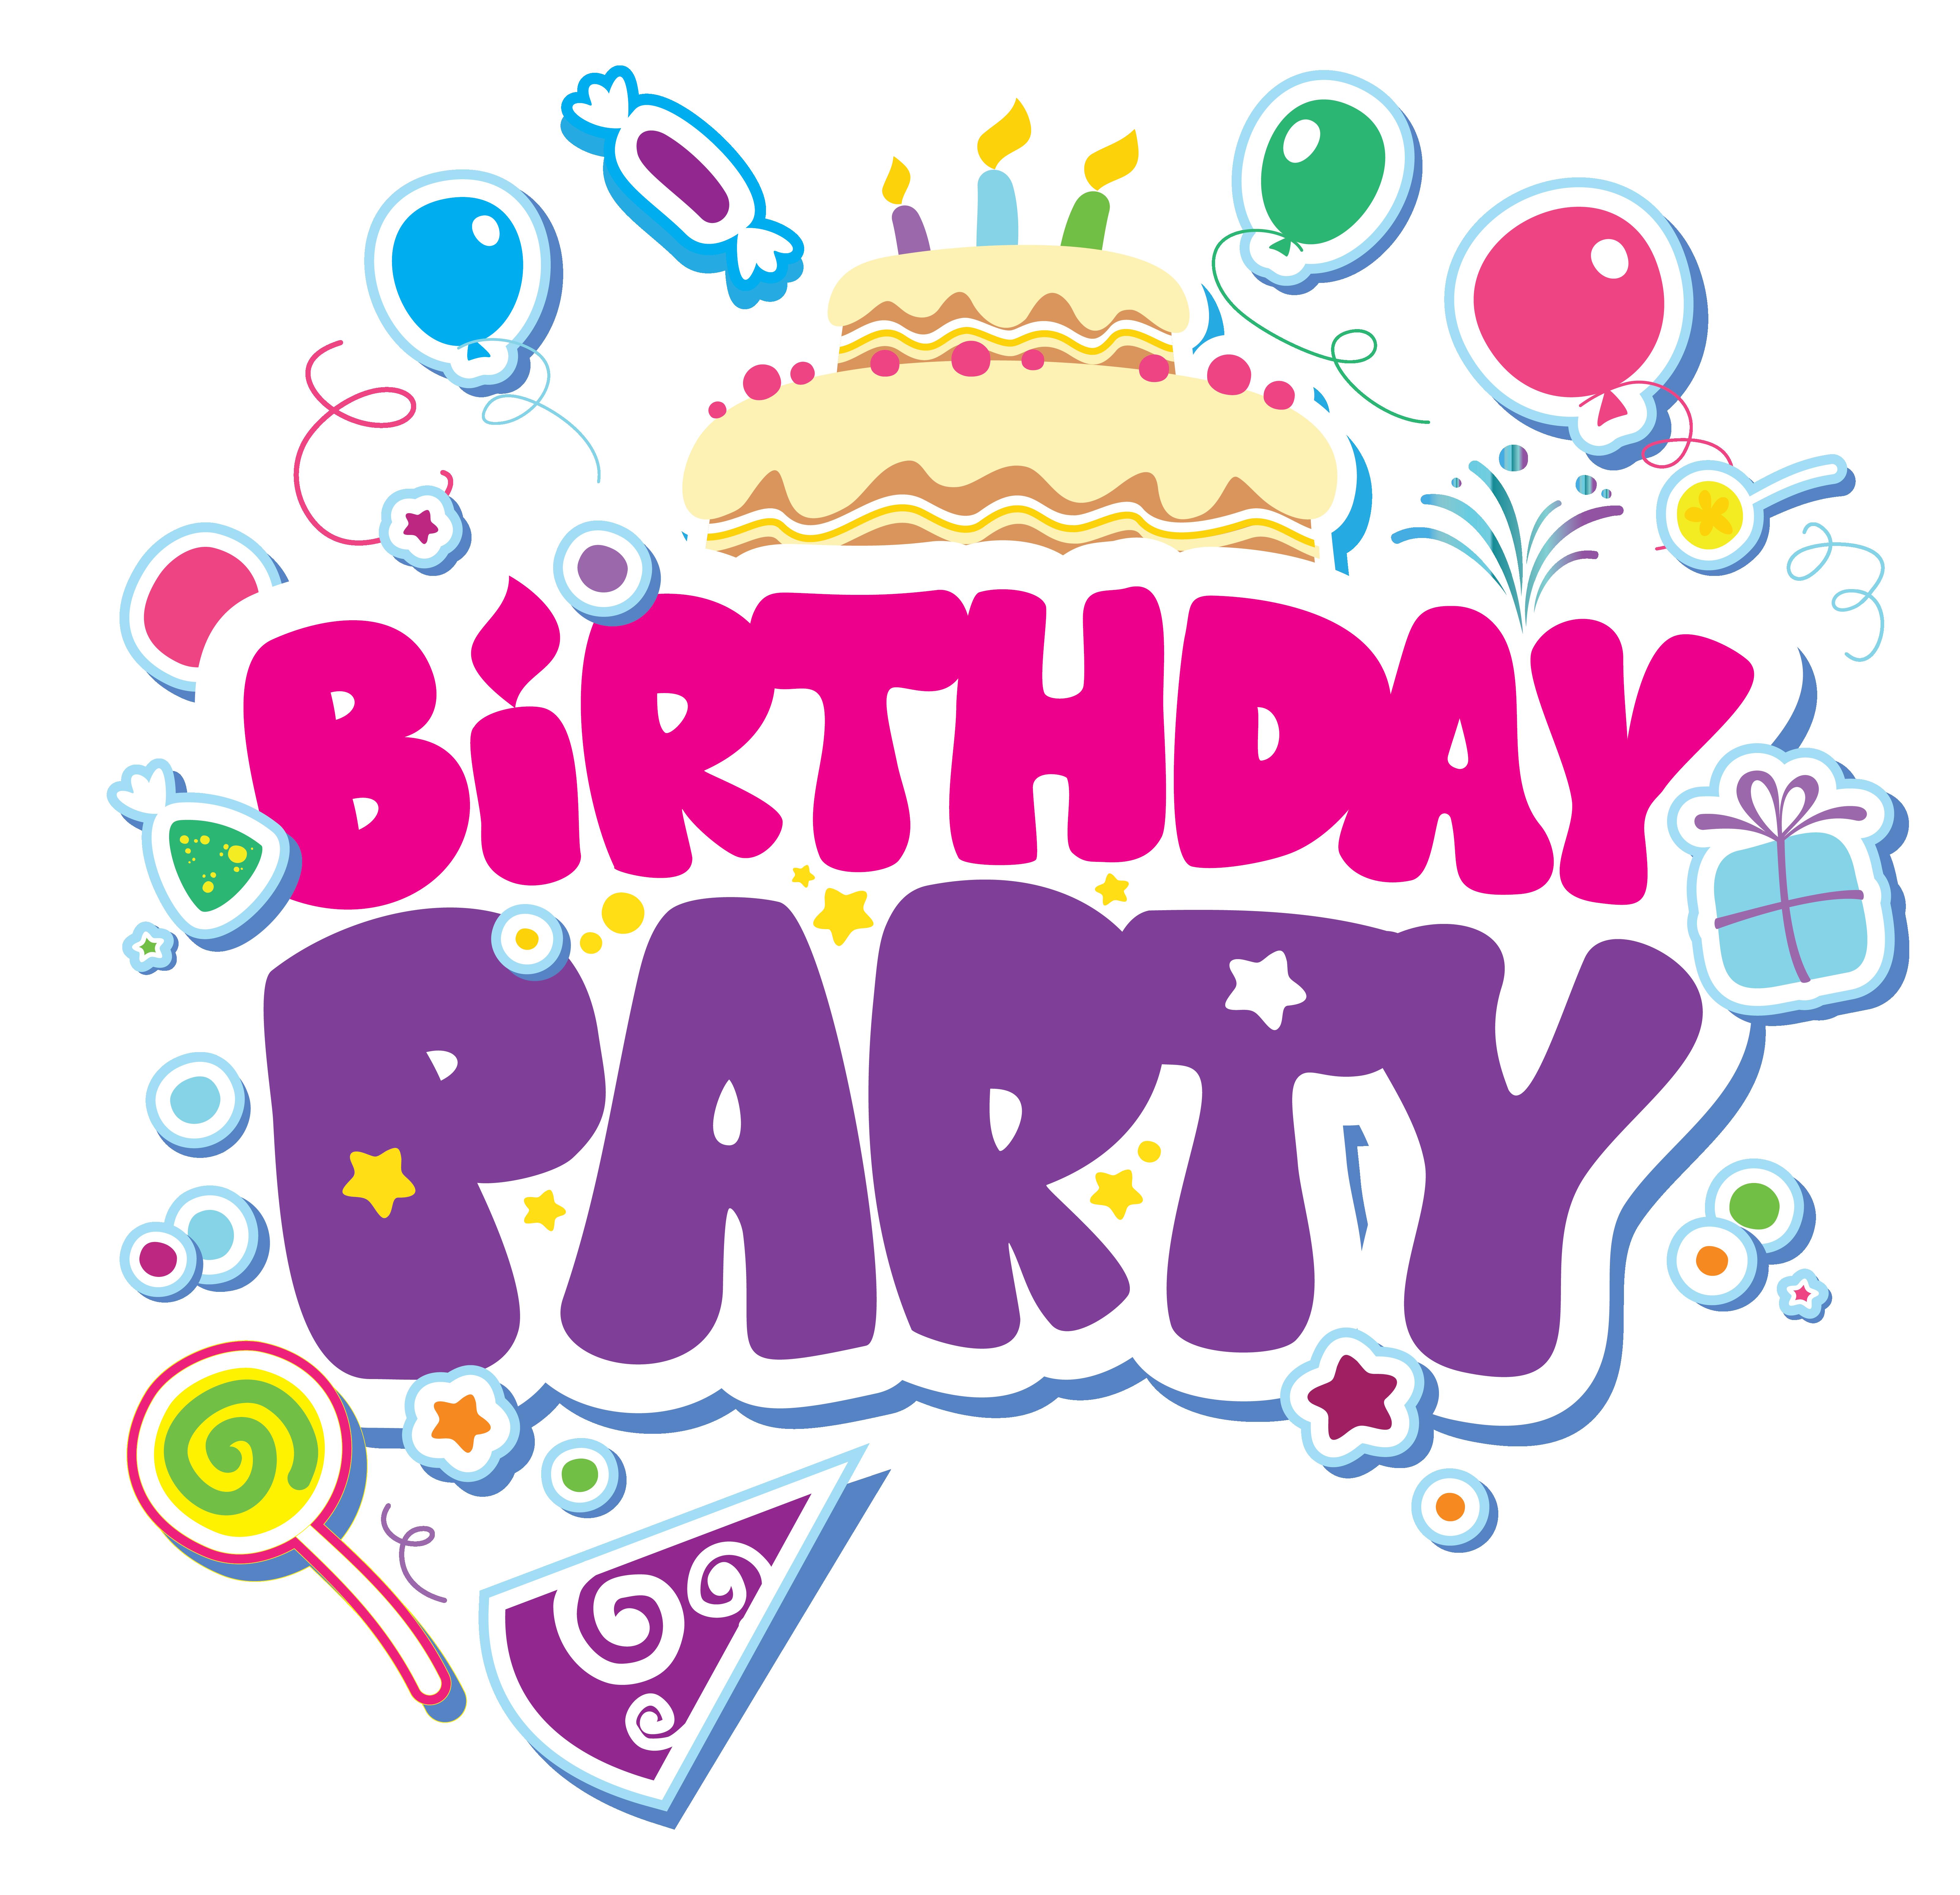 Free Png Hd Birthday Transparent Hd Birthdayg Images Pluspng